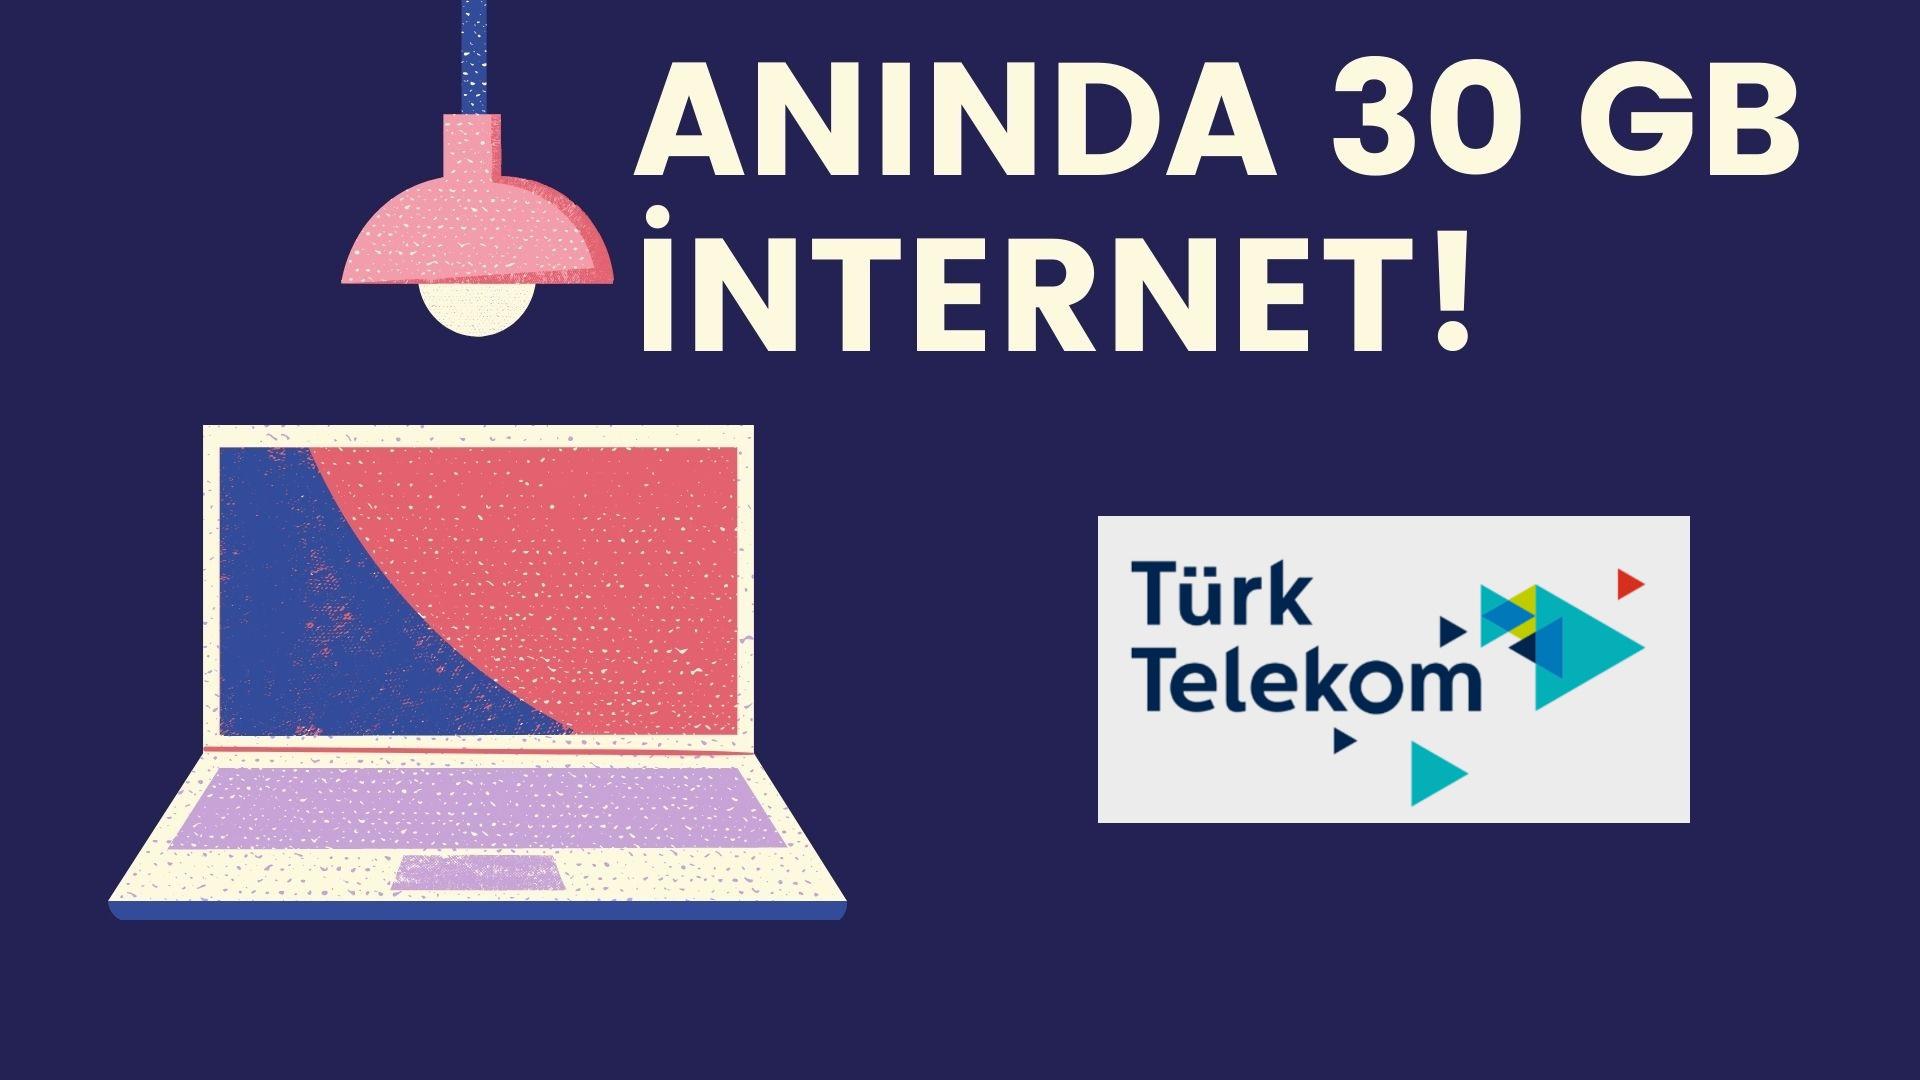 aninda turk telekom bedava internet